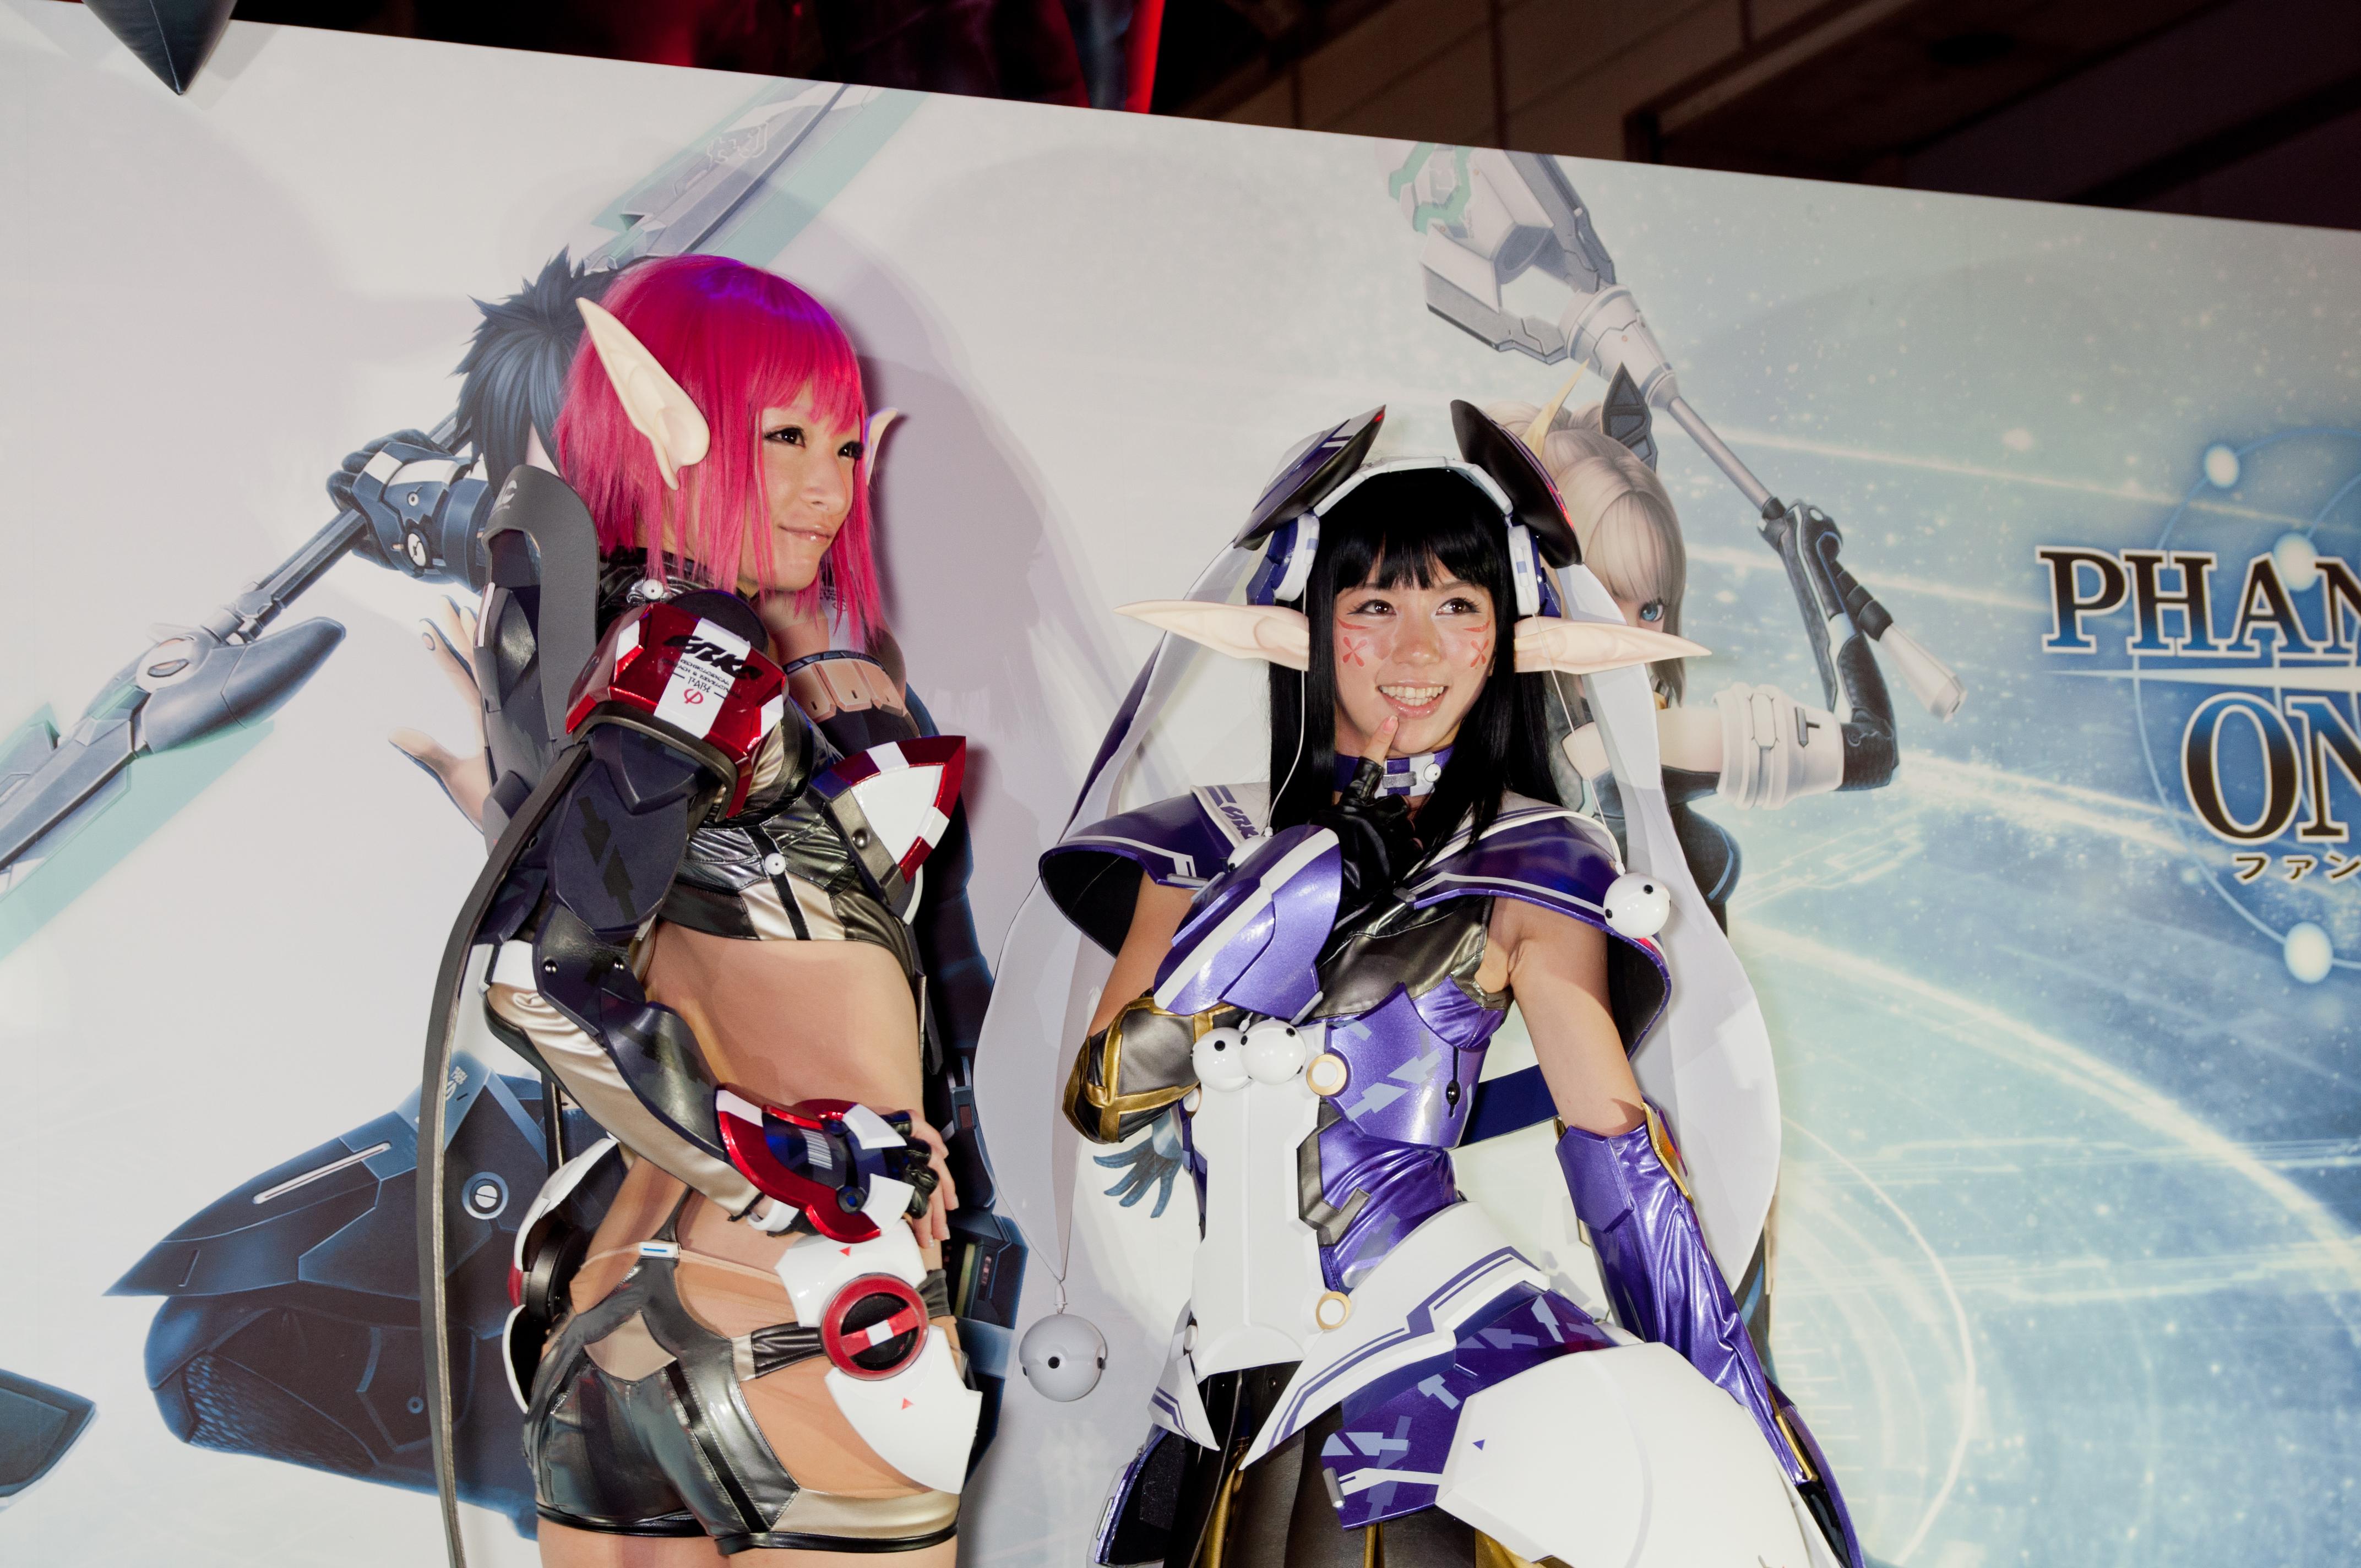 pso cosplayers Phantasy_Star_Online_cosplay_models_(2012)